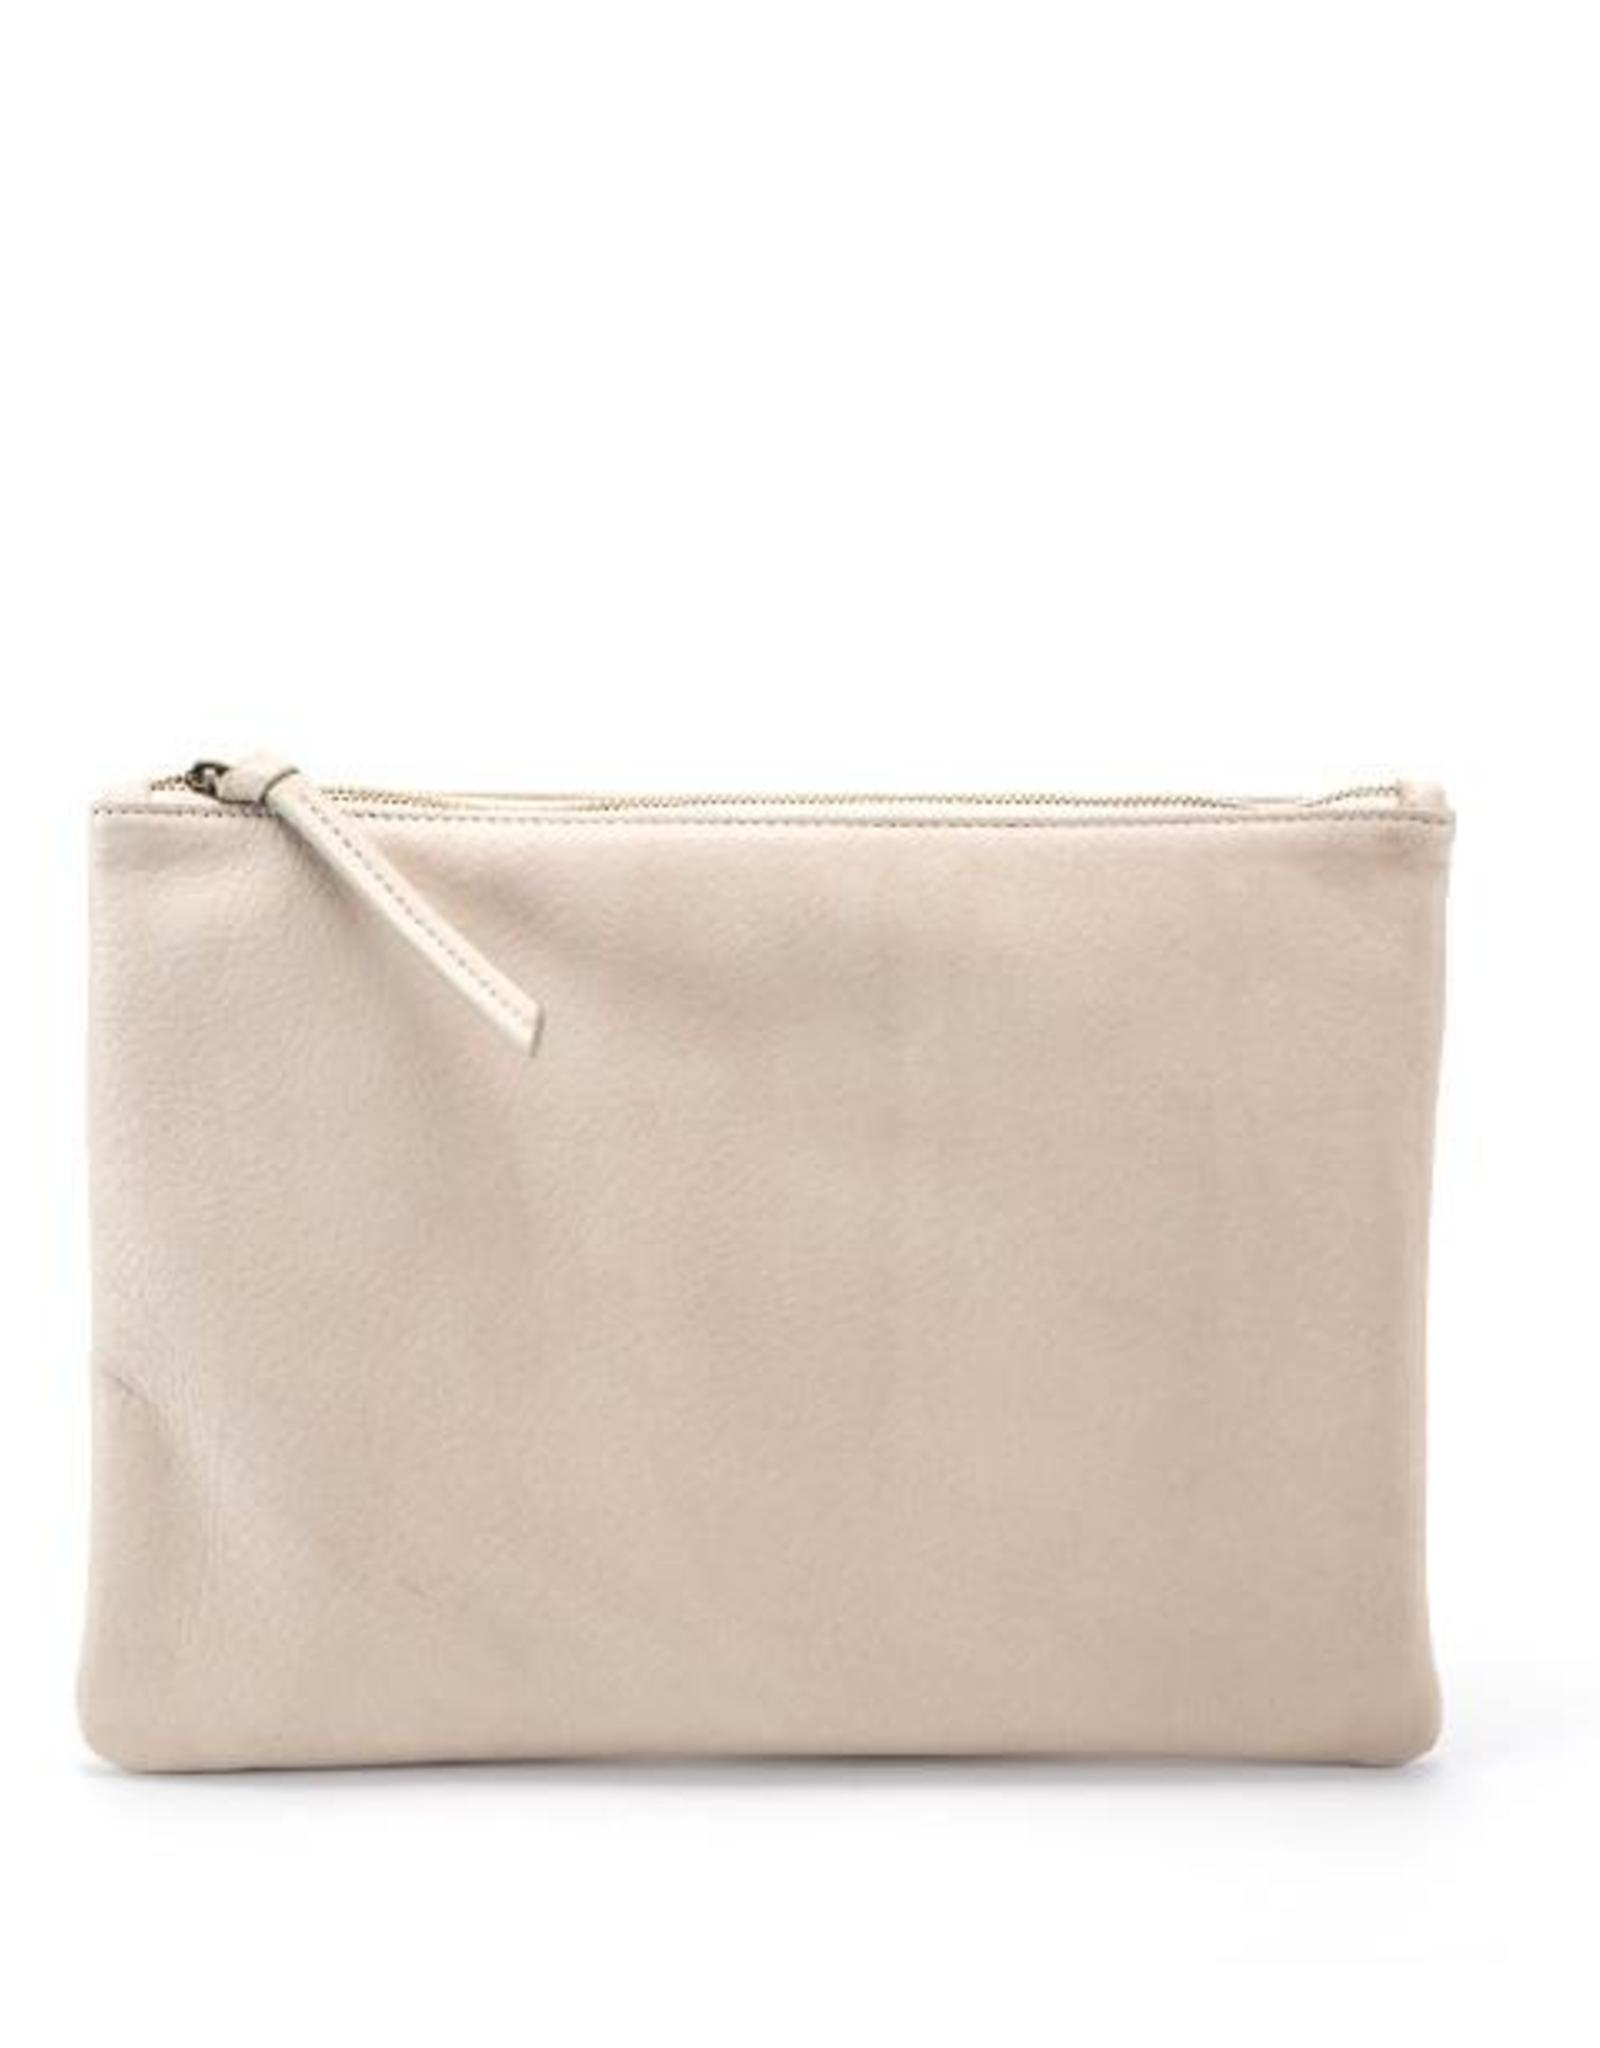 Handbags Molly G - Rebel Clutch in Bone